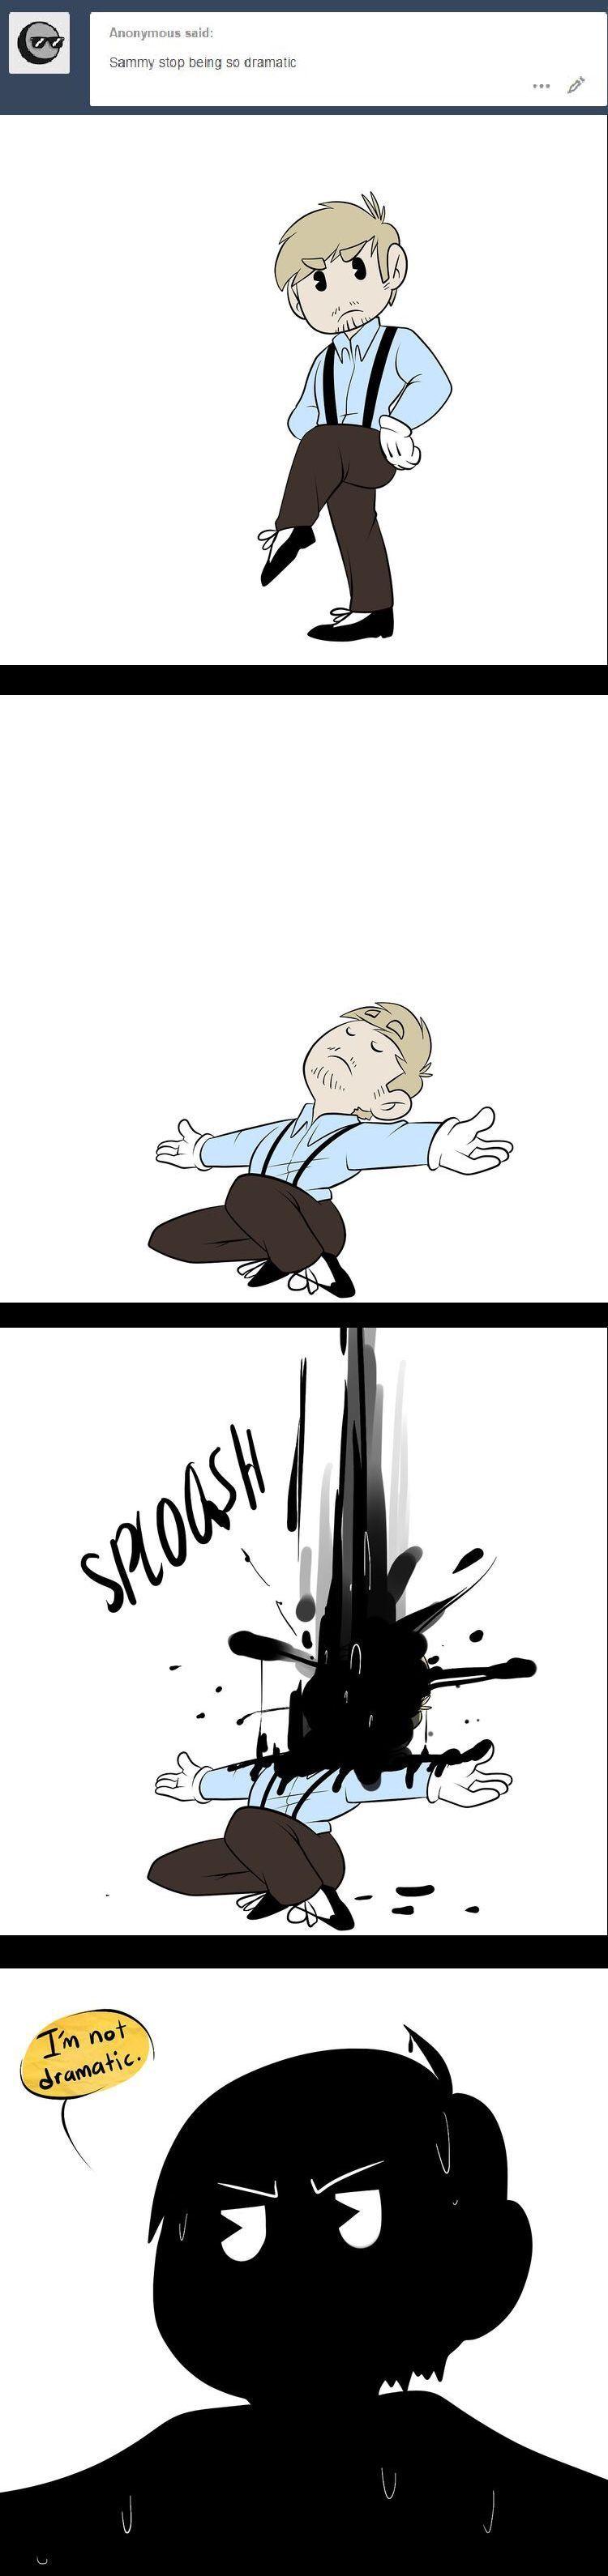 Dramatic - Mod Animator